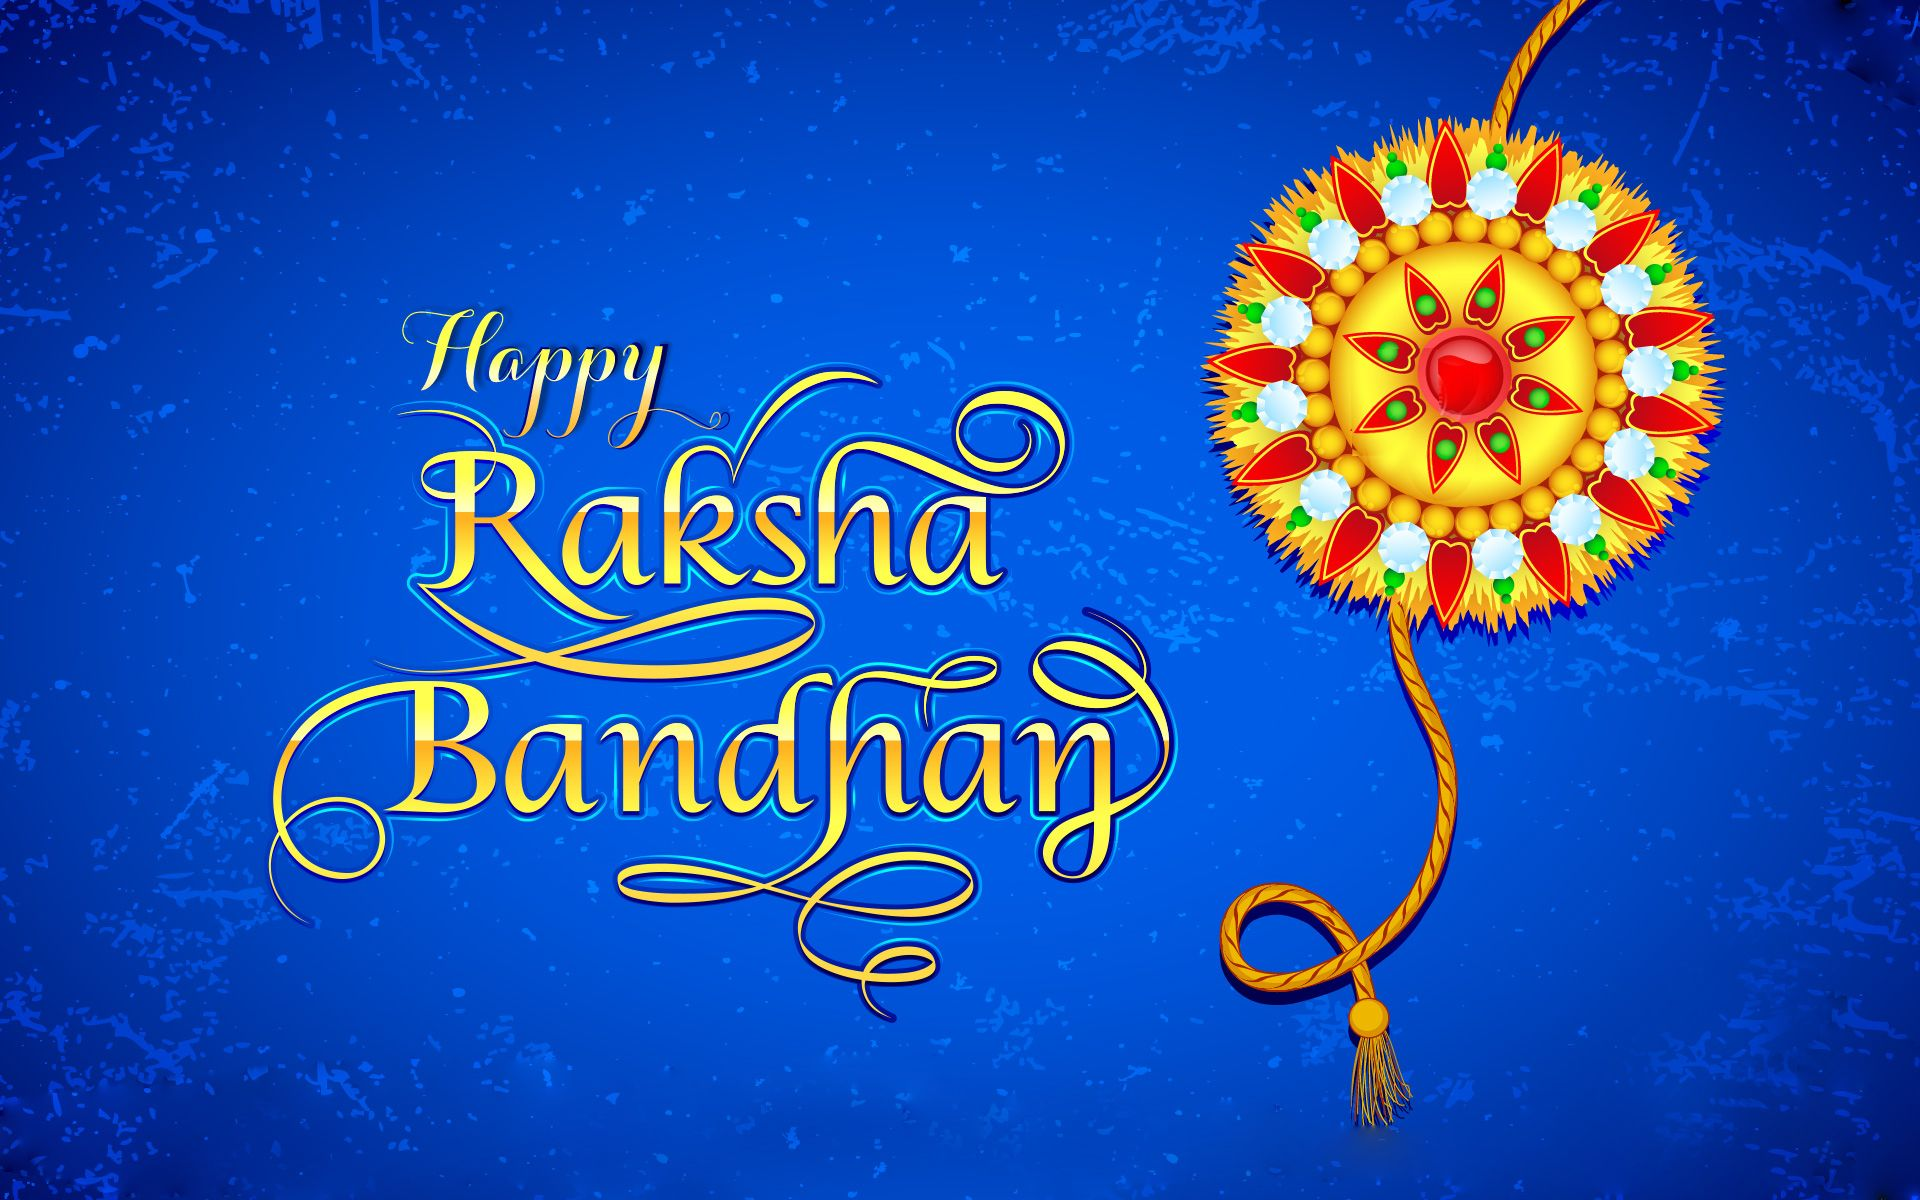 Beautiful Rakhi Hd Wallpaper Happy Raksha Bandhan Rakhi Brother